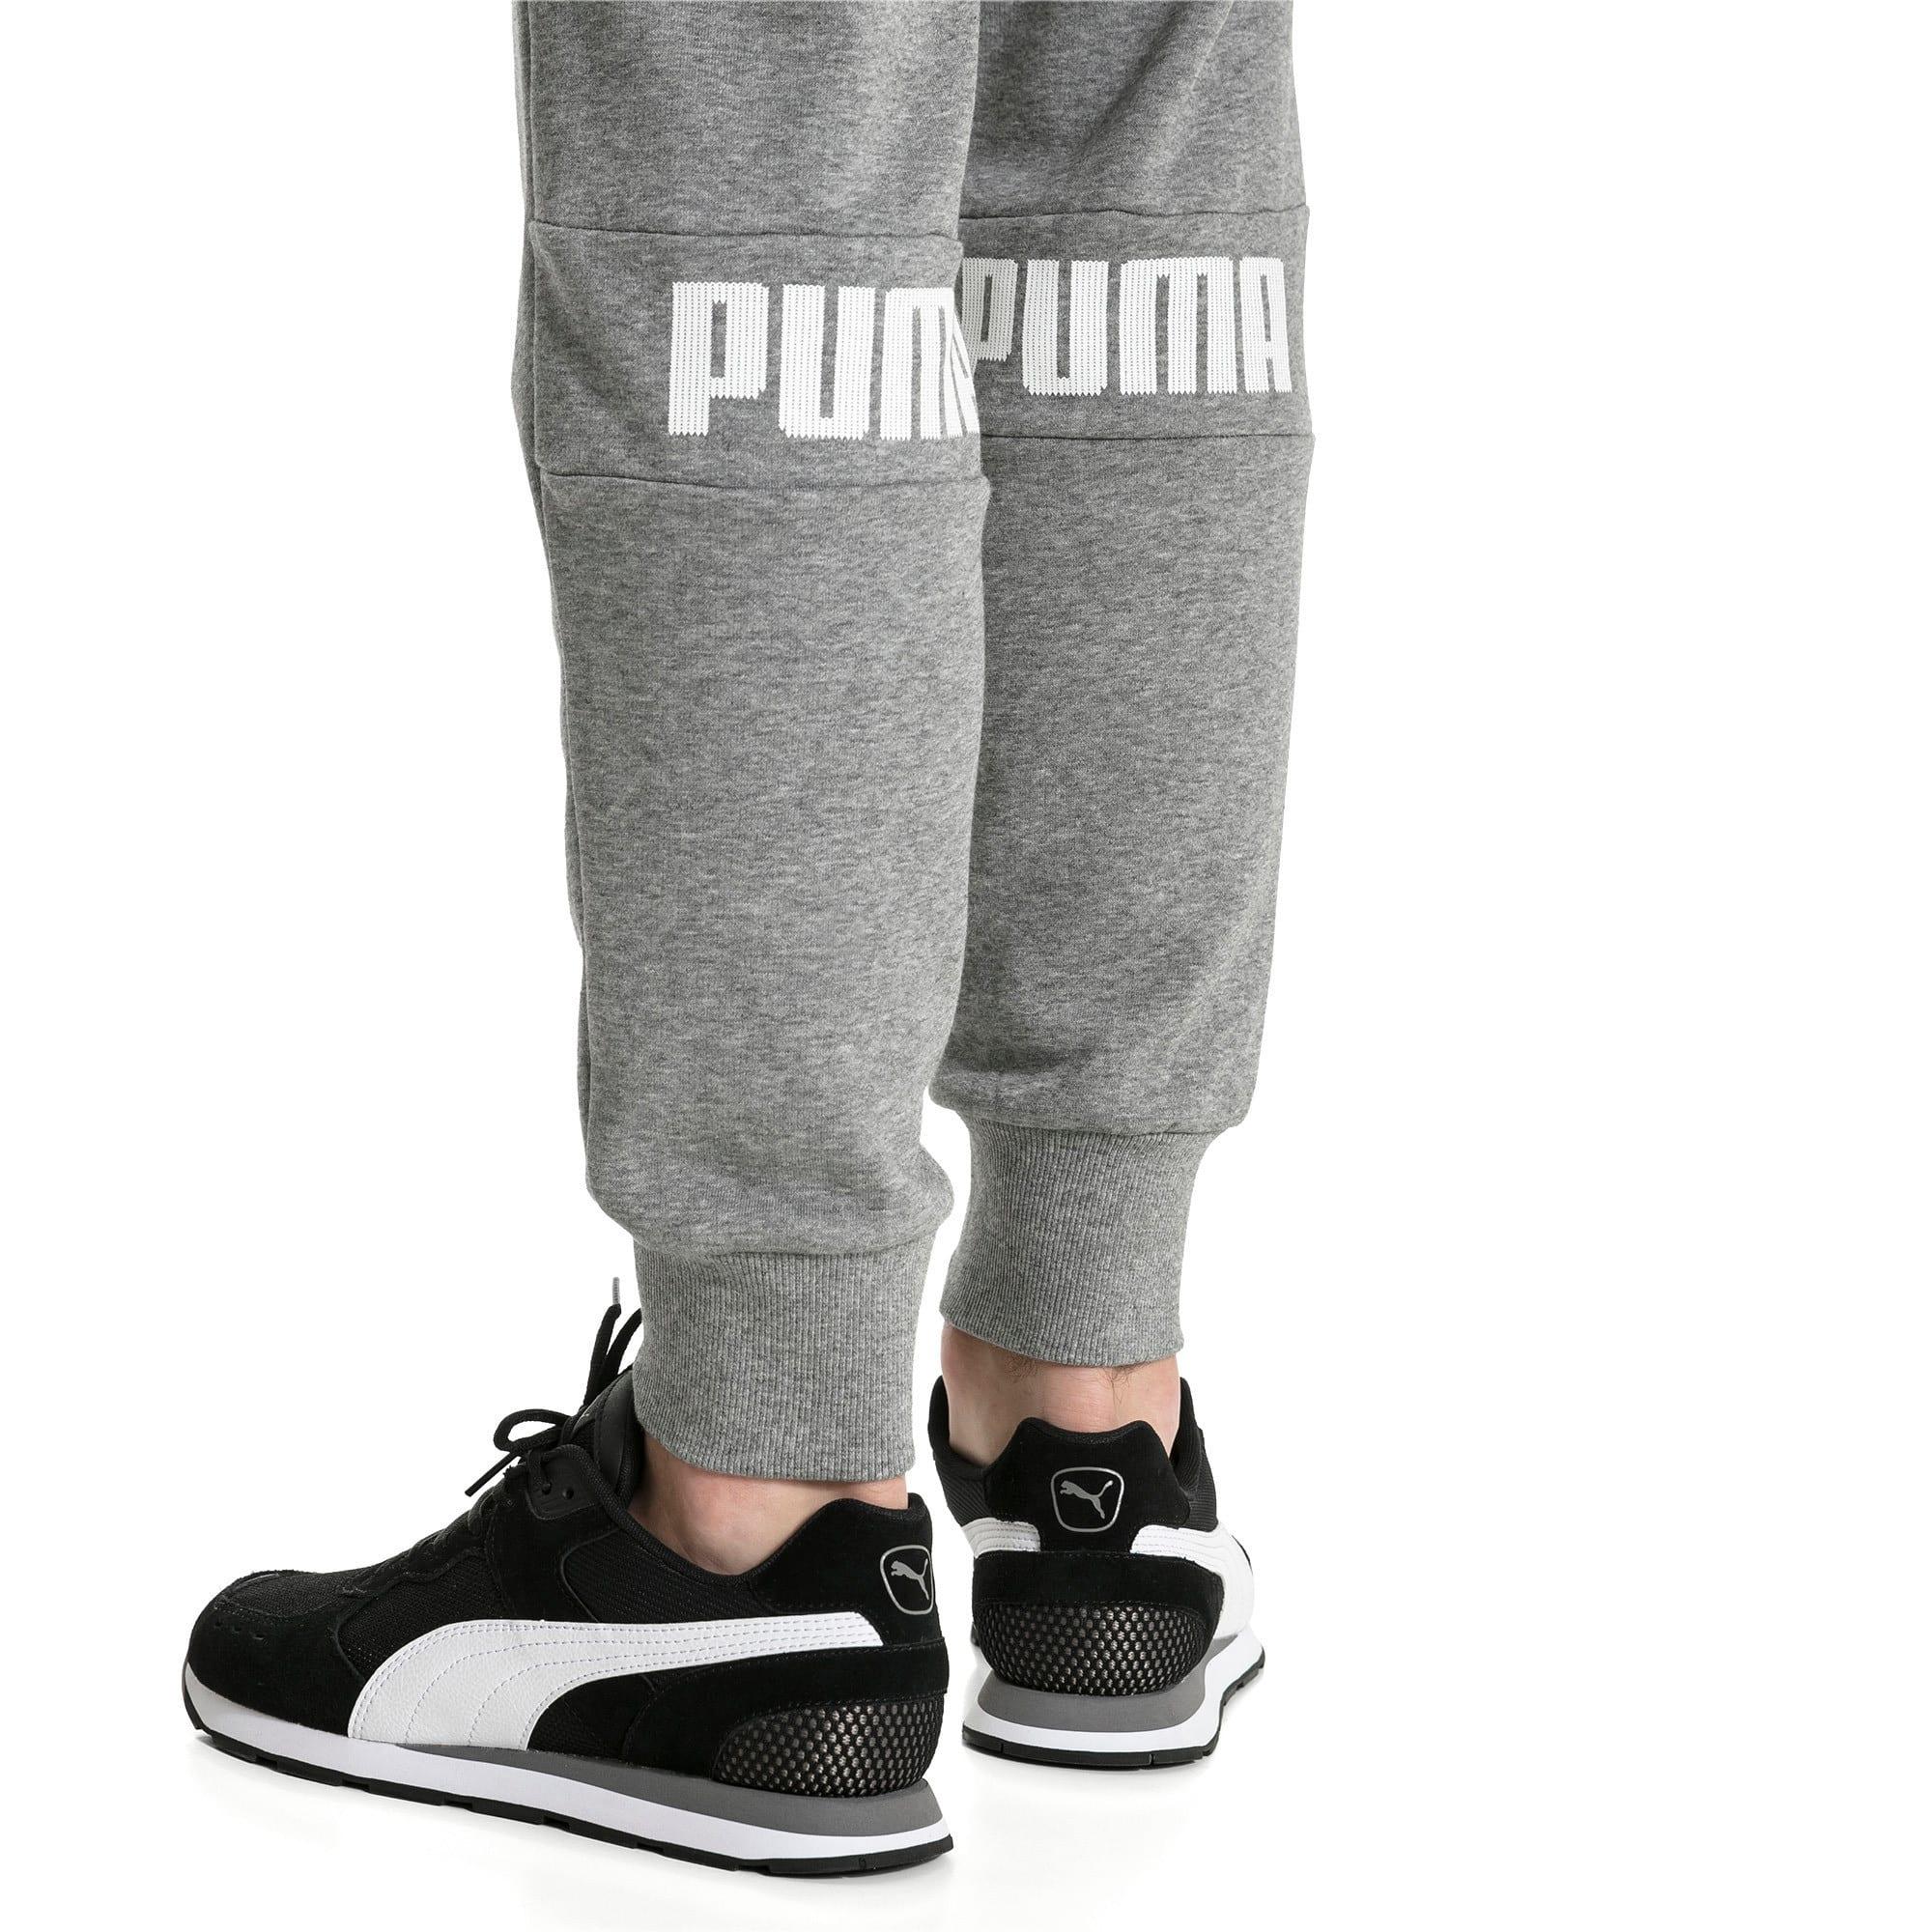 Thumbnail 4 of Amplified Men's Sweatpants, Medium Gray Heather, medium